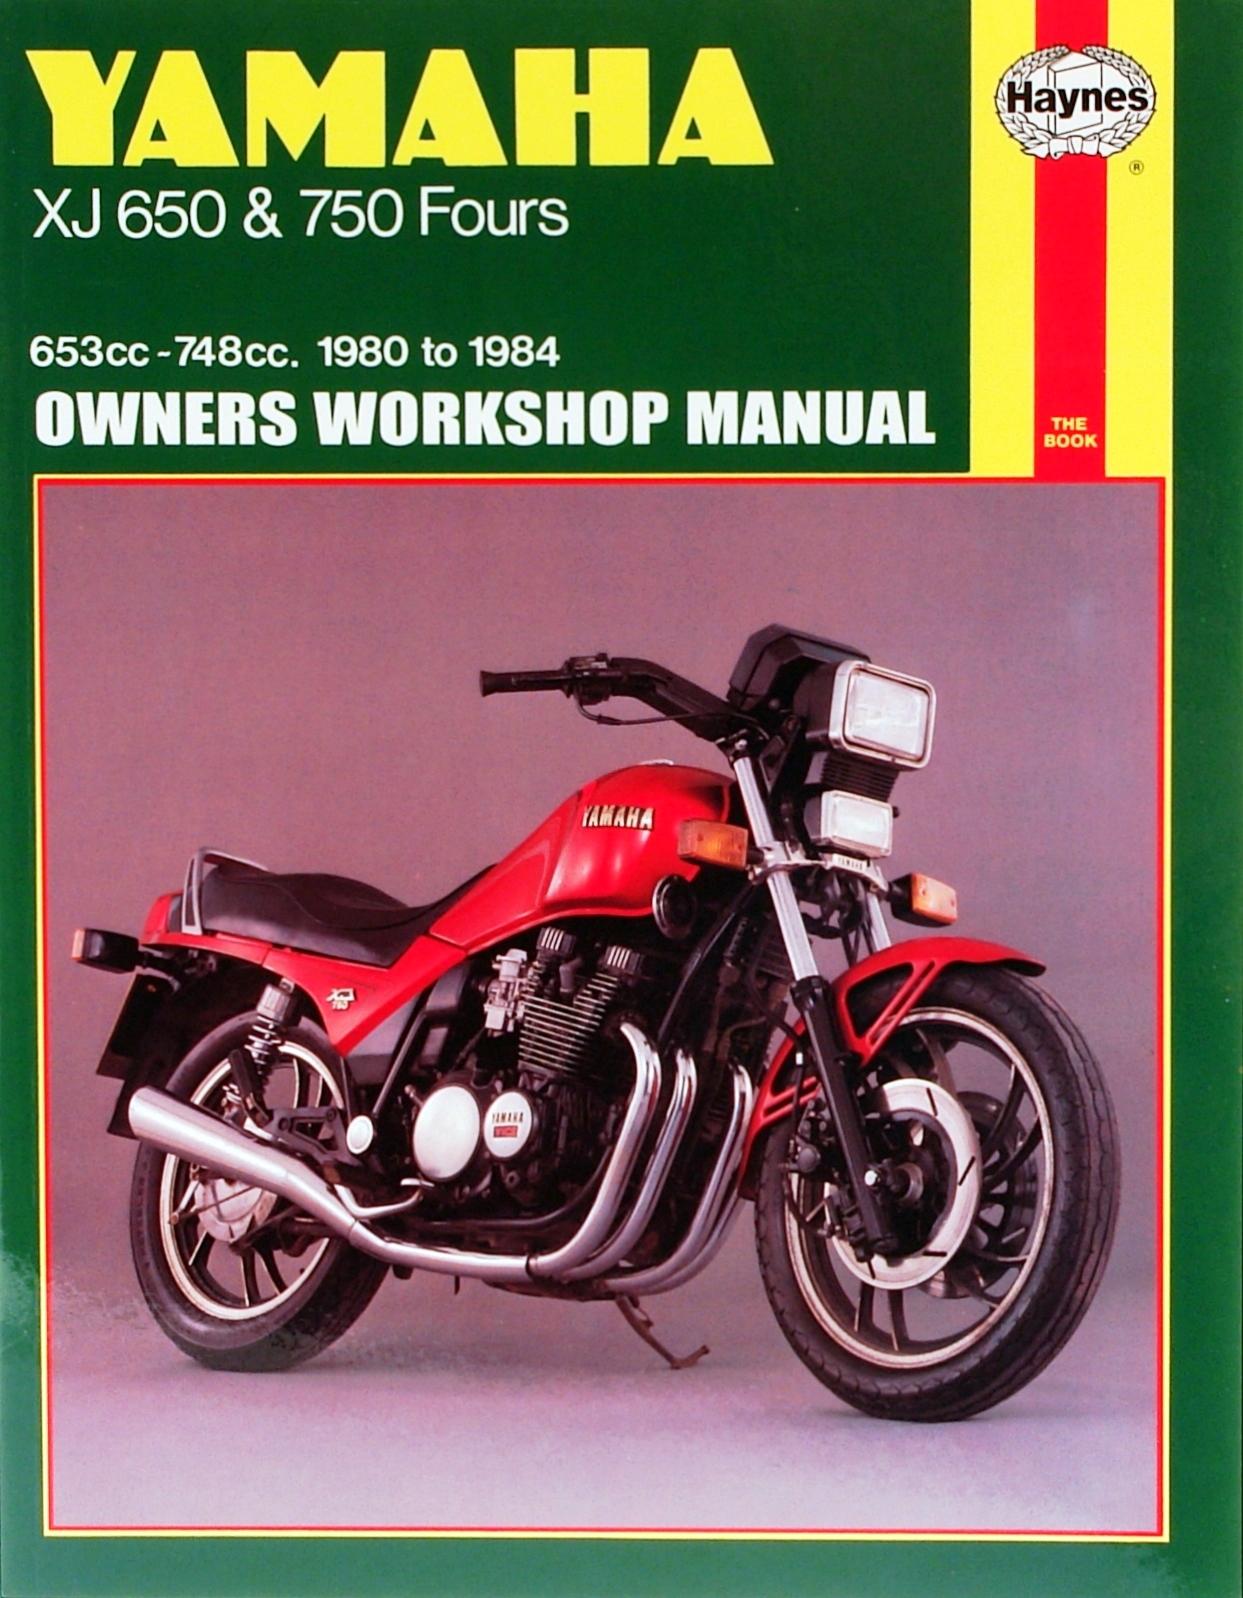 Yamaha XJ650 and 750 1980-1984 Repair Manual